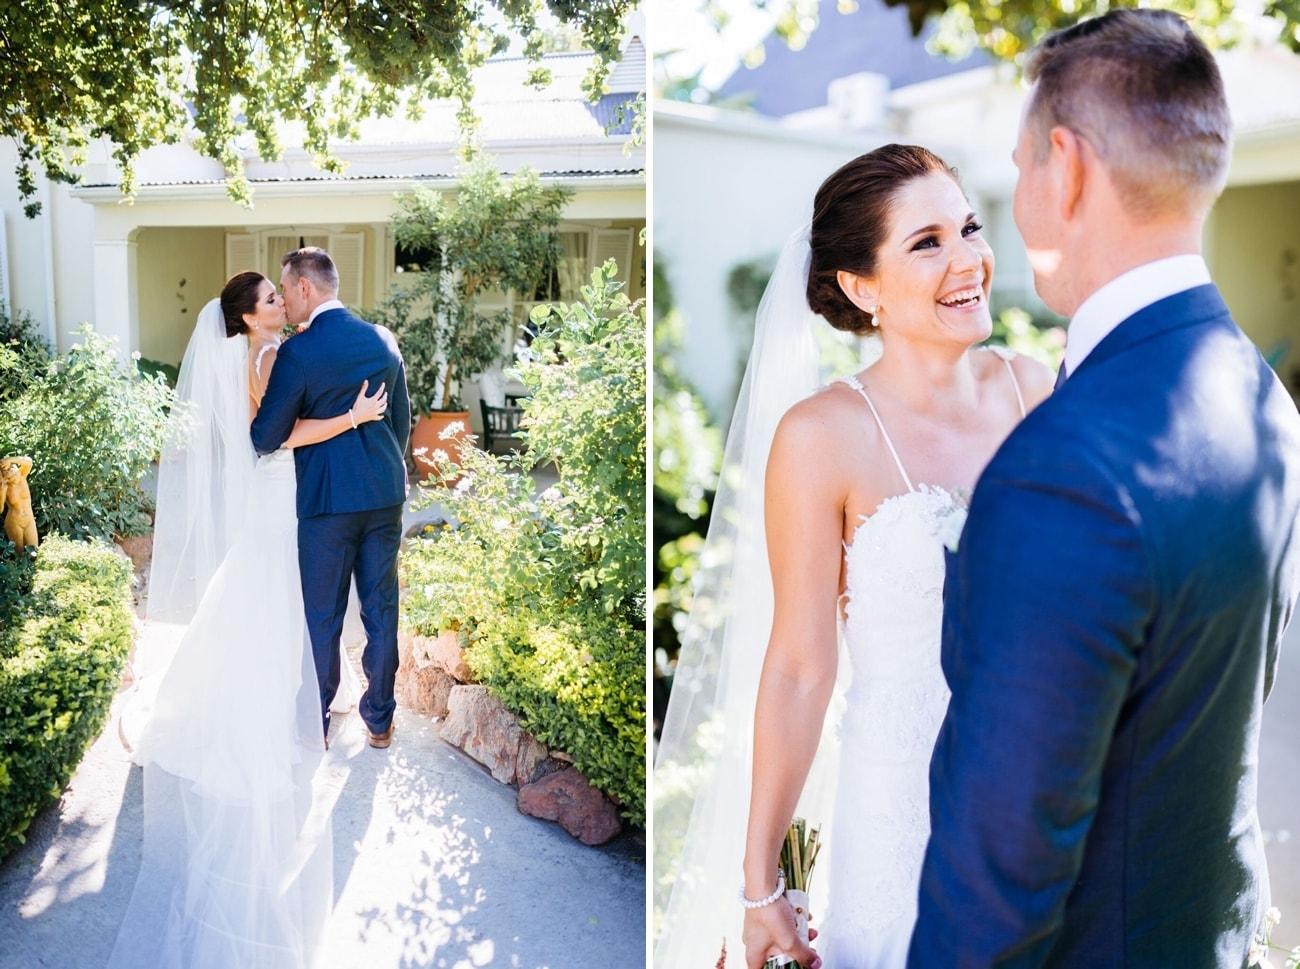 Bride and groom portrait | Credit: Matthew Carr